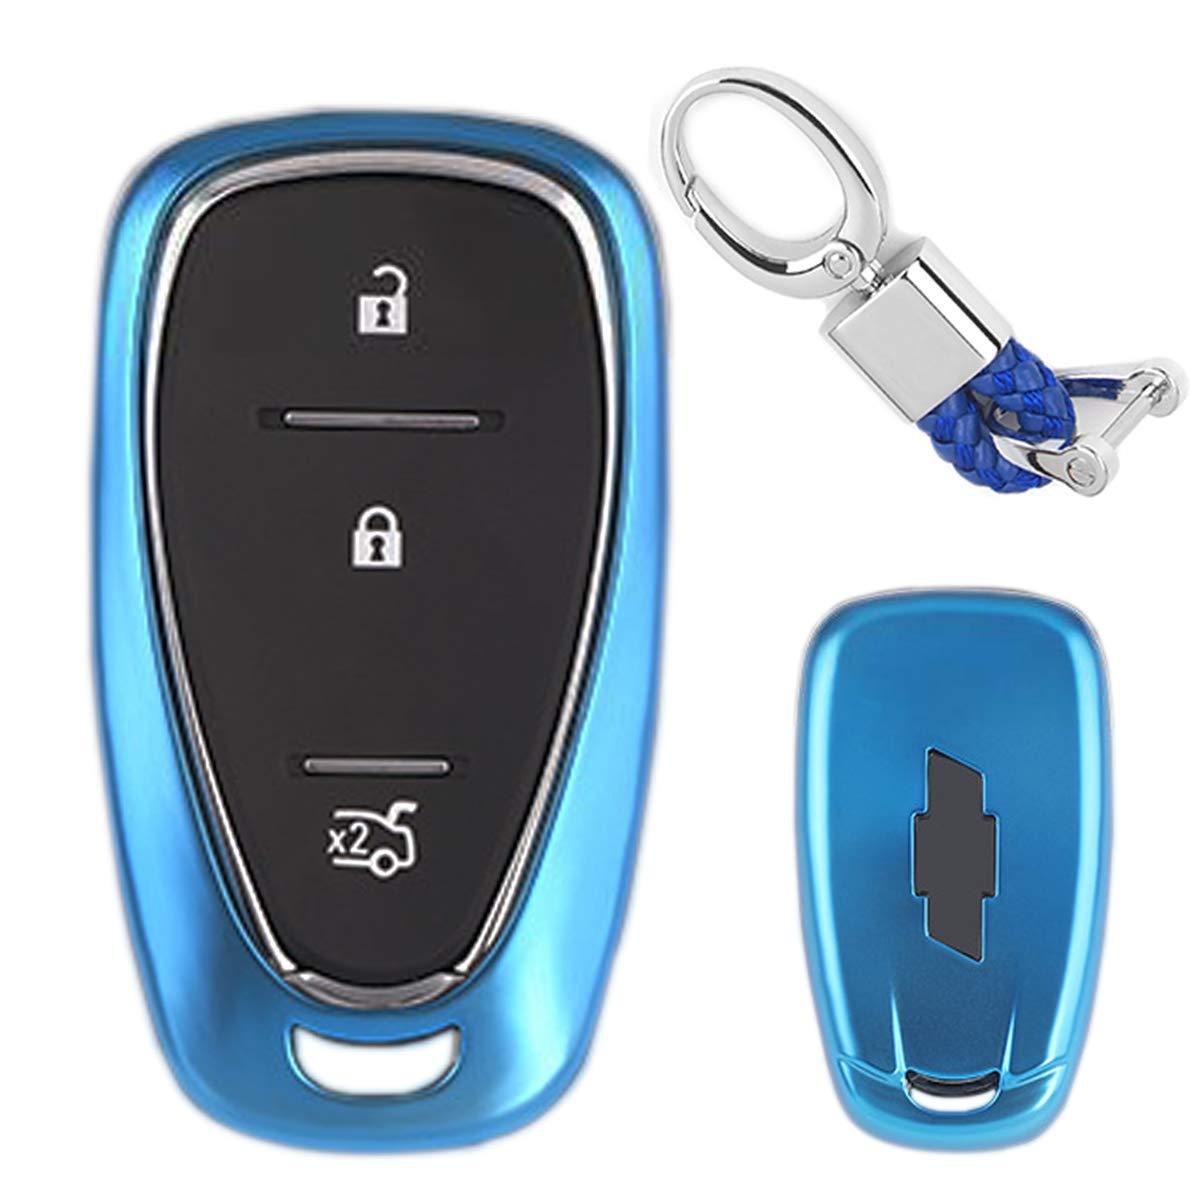 MODIPIM Keyless Entry Remote Cover Soft TPU Key Fob Case with Diamond Tassel Keychain for Chevrolet Camaro Cruze Spark Volt Malibu Bolt Sonic Trax 2//3//4//5-Buttons Smart Key Color Blue